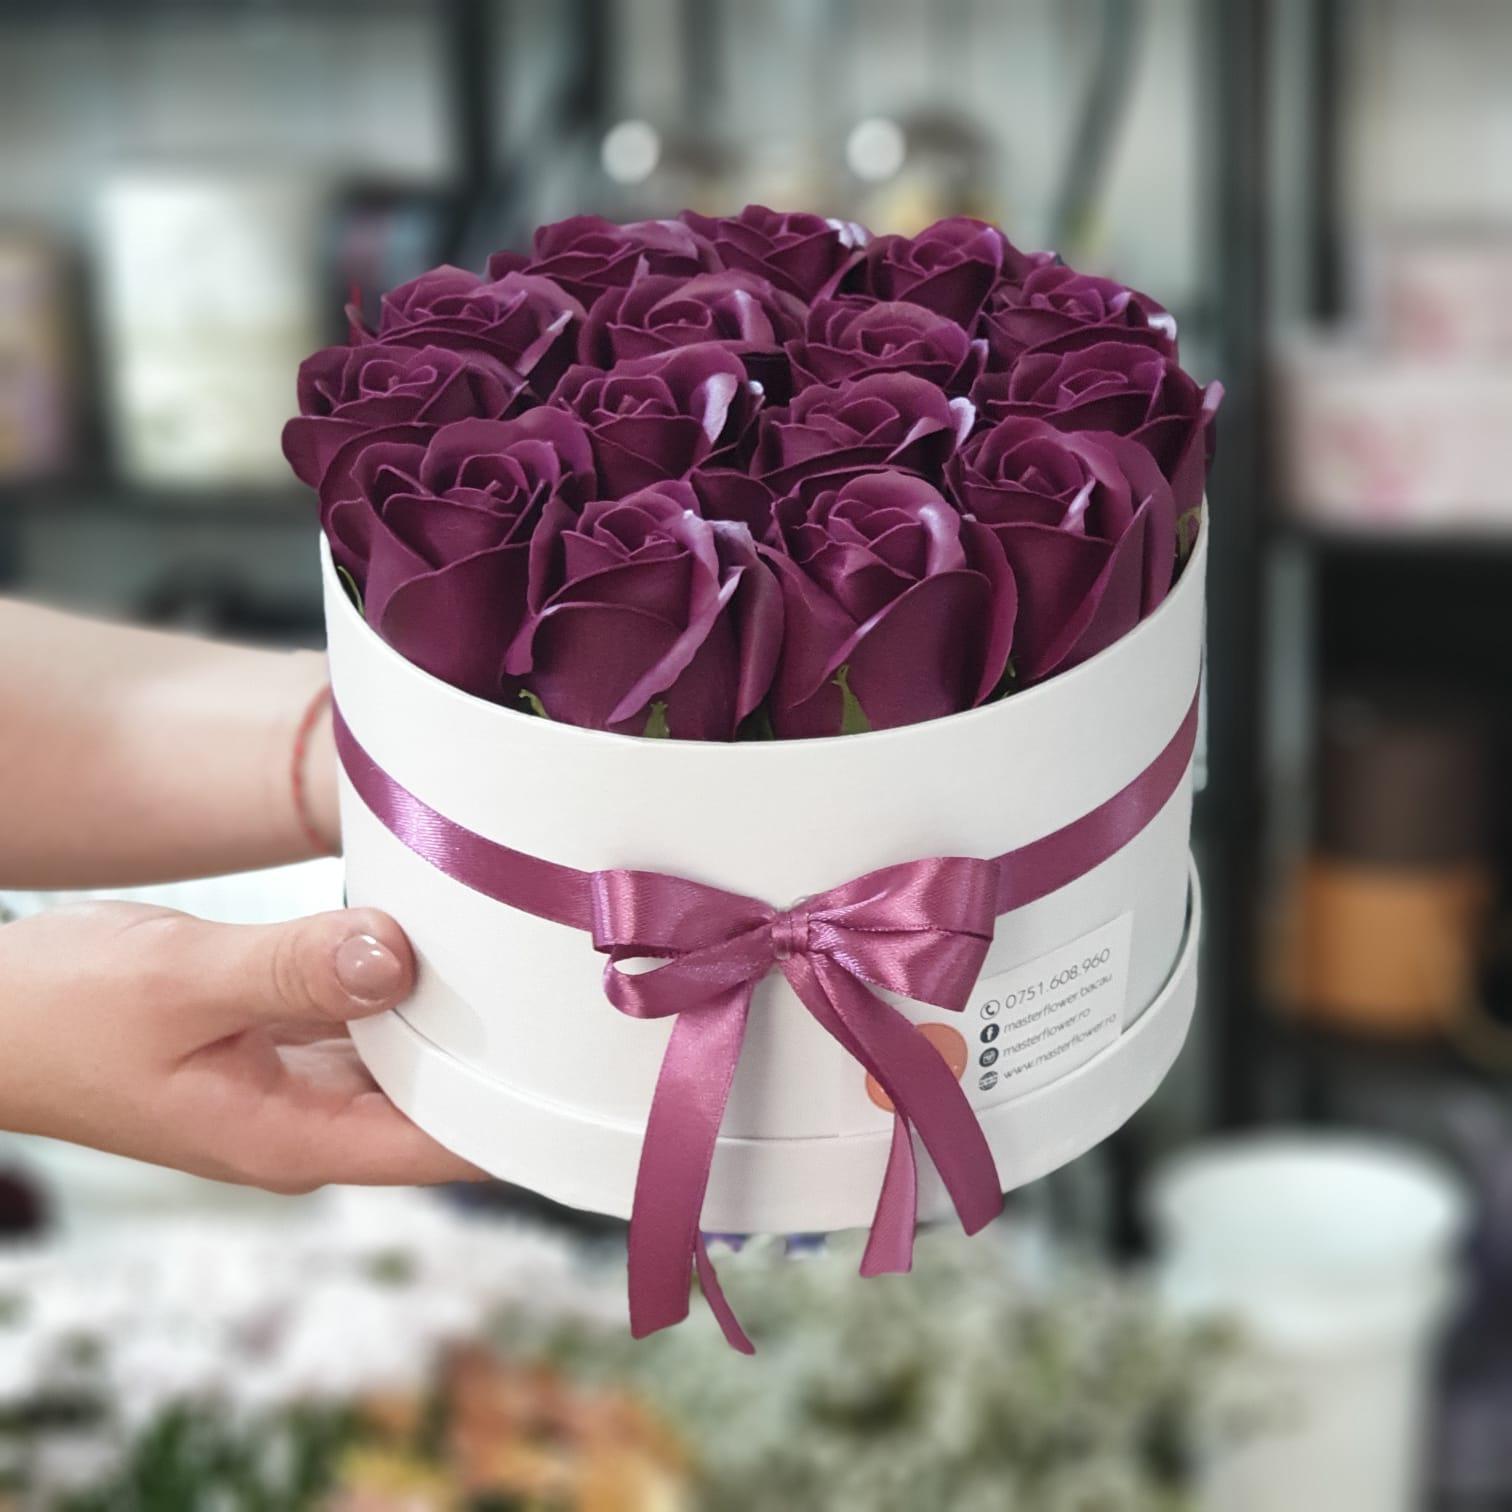 Aranjament cu trandafiri mov de sapun (marsalla) - S